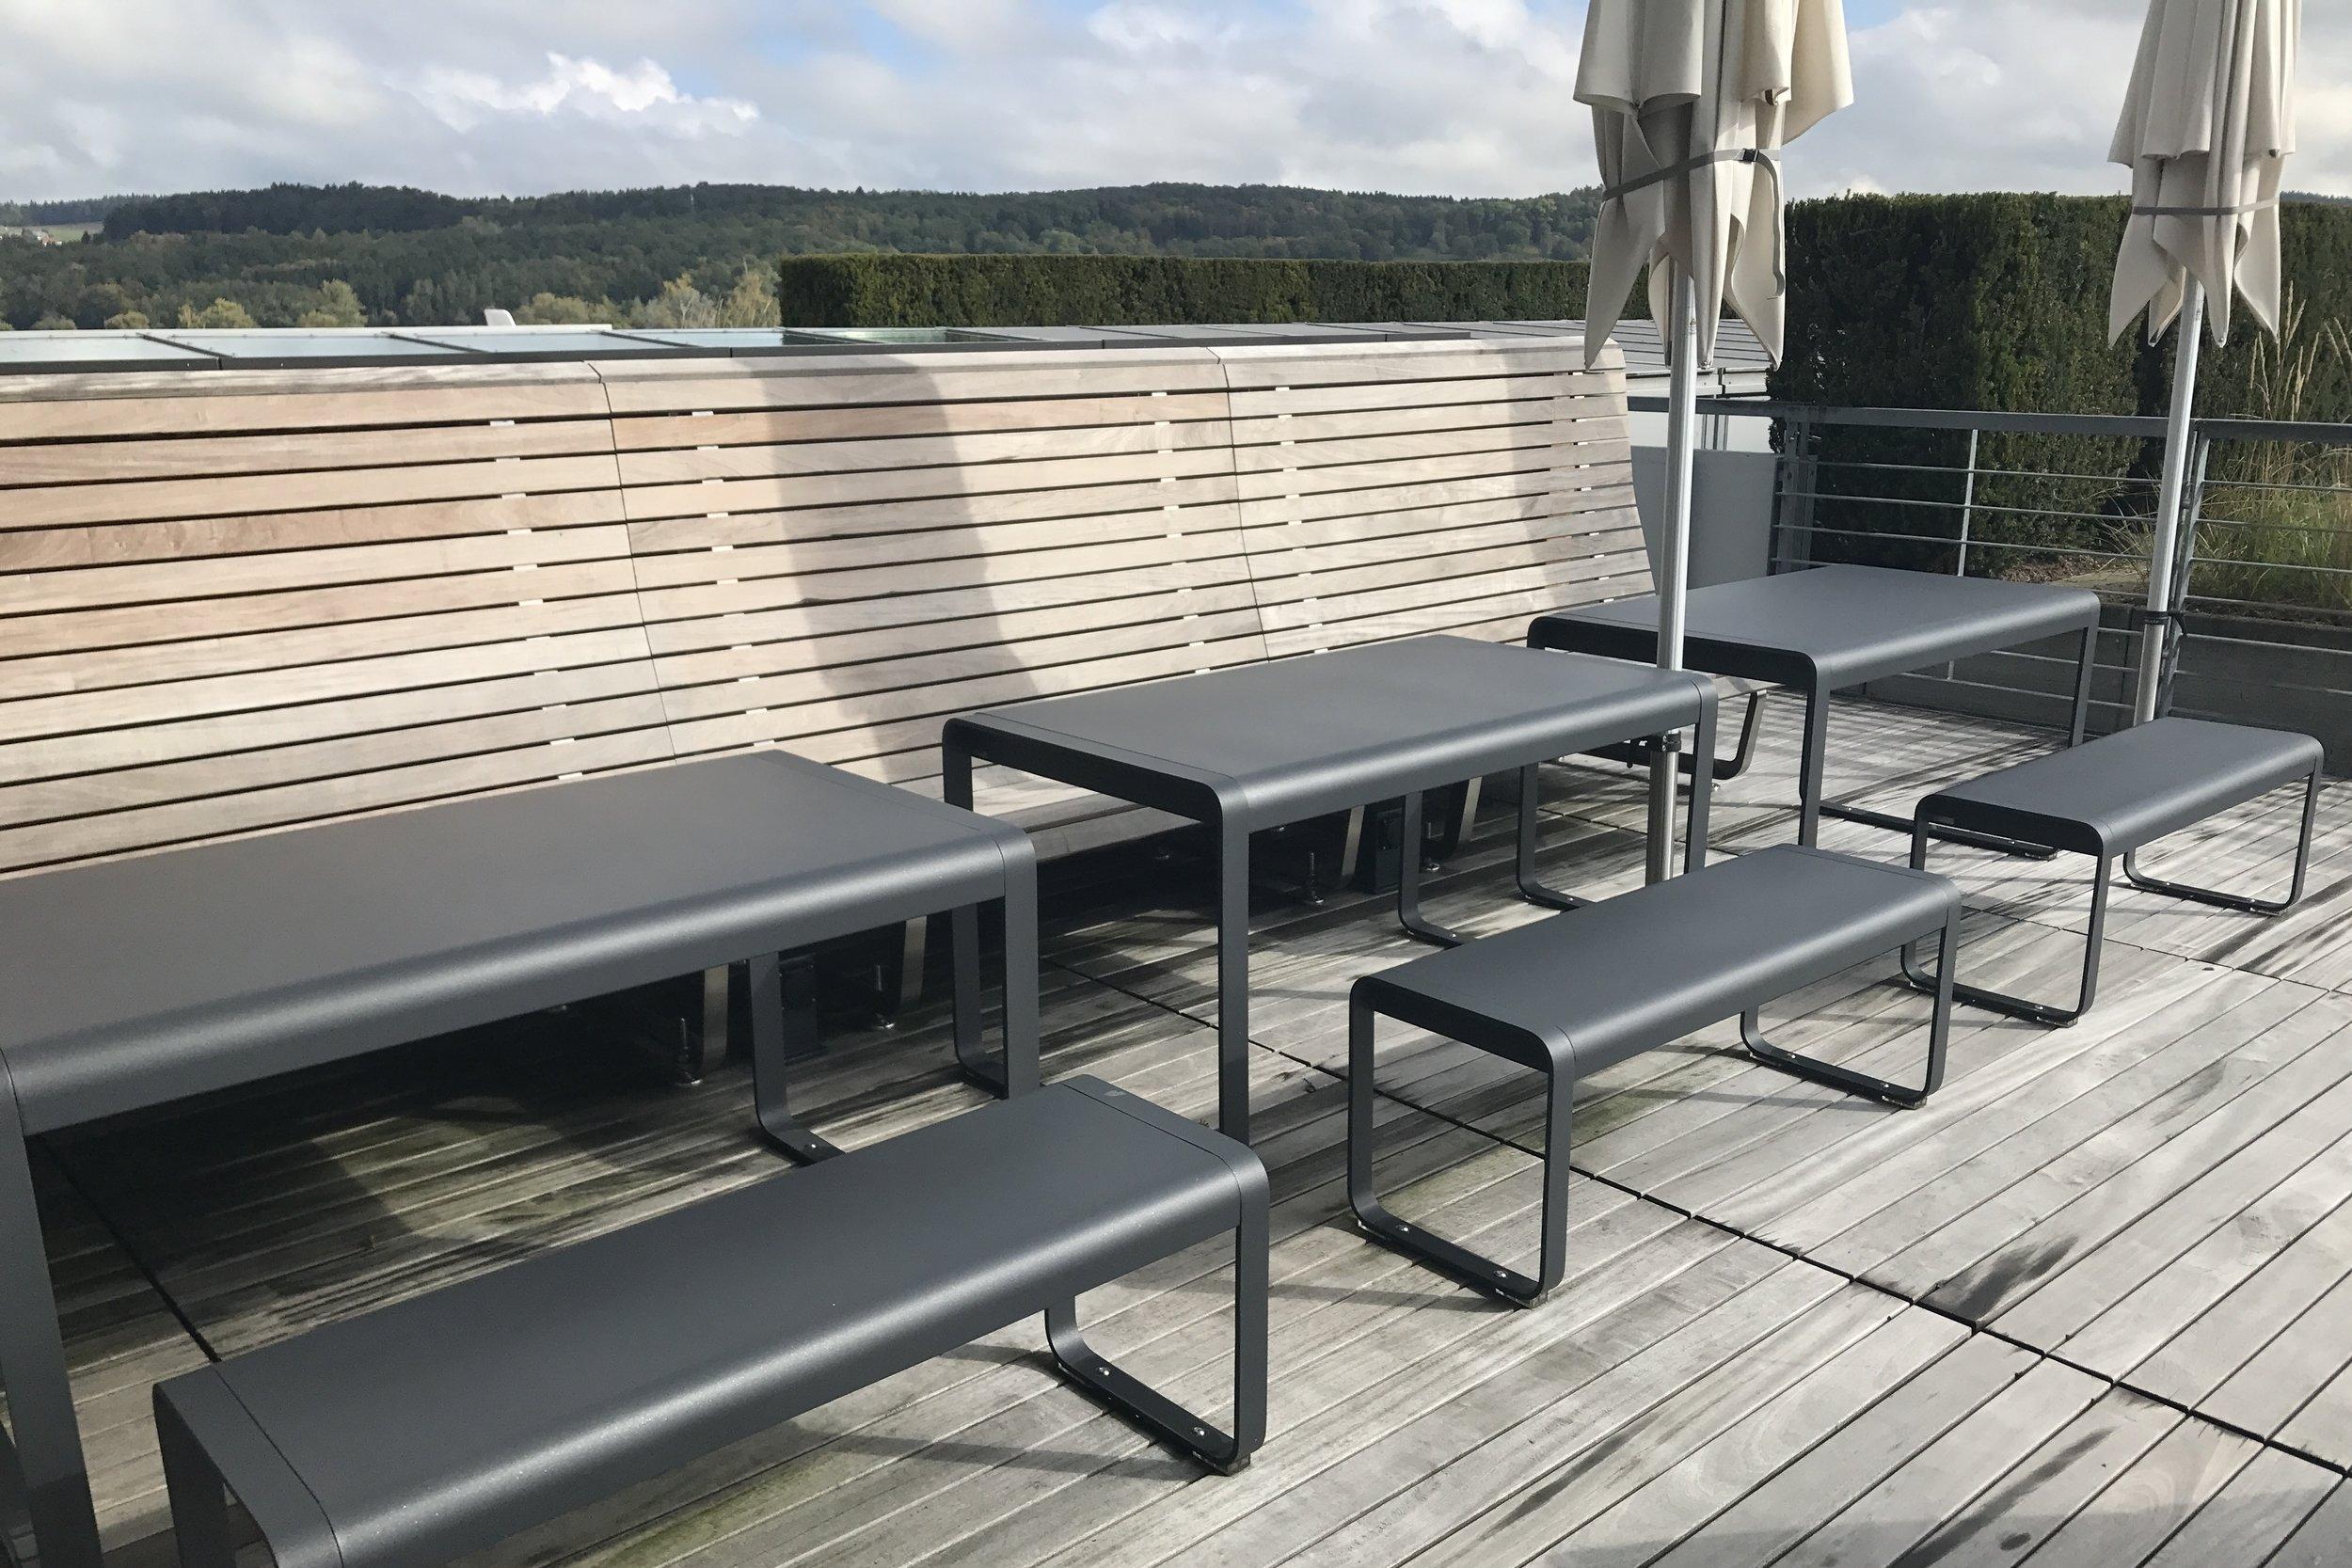 Swiss First Class Lounge Zurich – Patio furniture